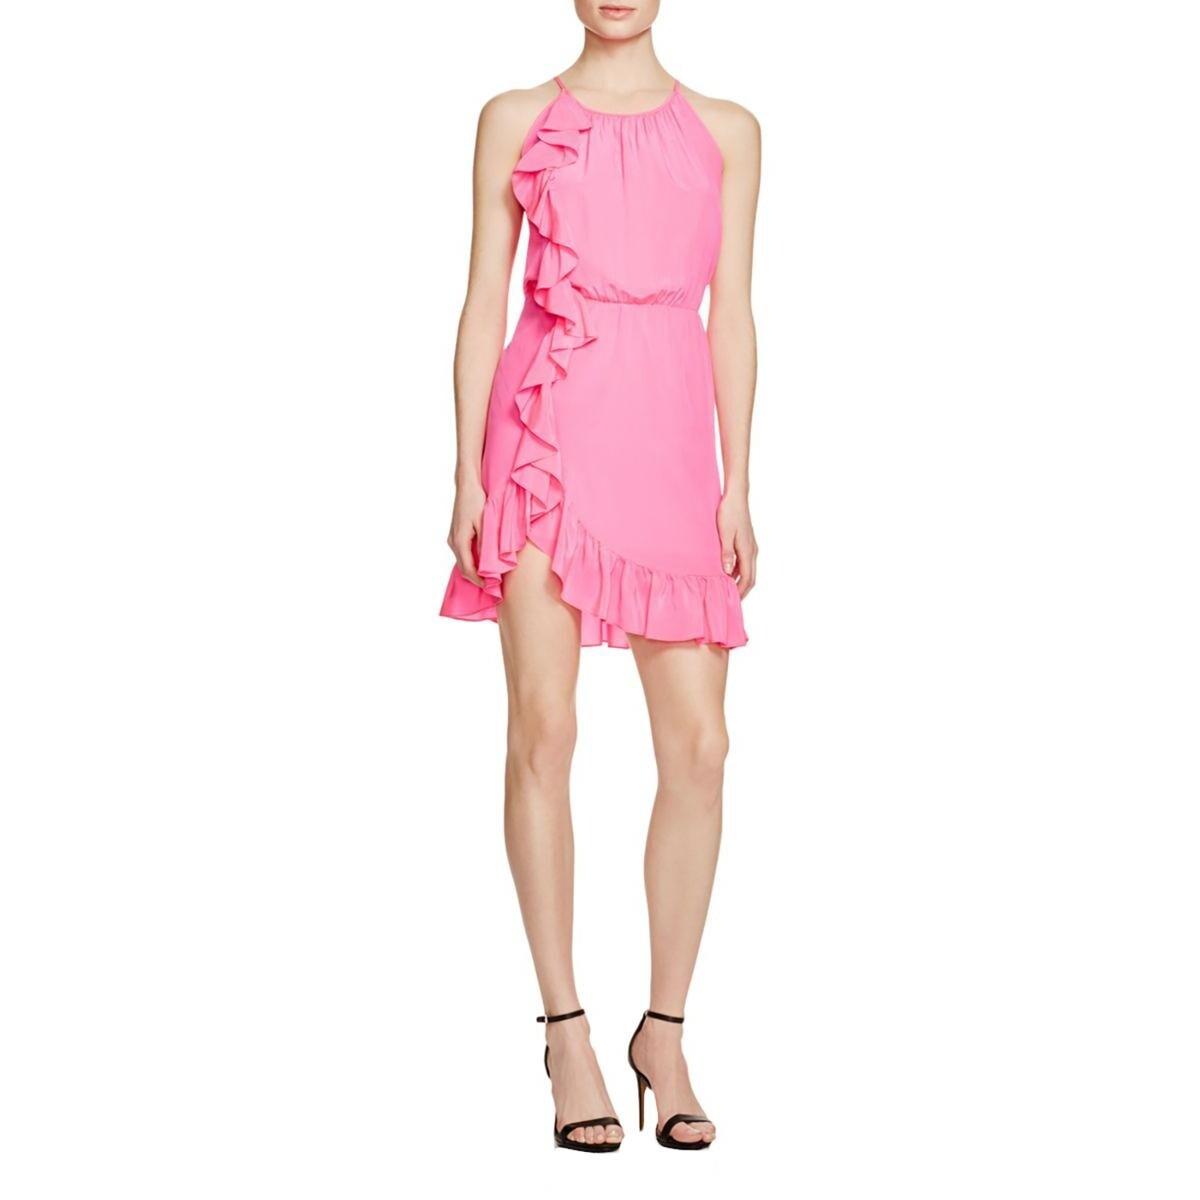 5d869ba3471 Shop Amanda Uprichard Womens Juniors Casual Dress Silk Cascade Ruffle -  Free Shipping Today - Overstock - 16796650